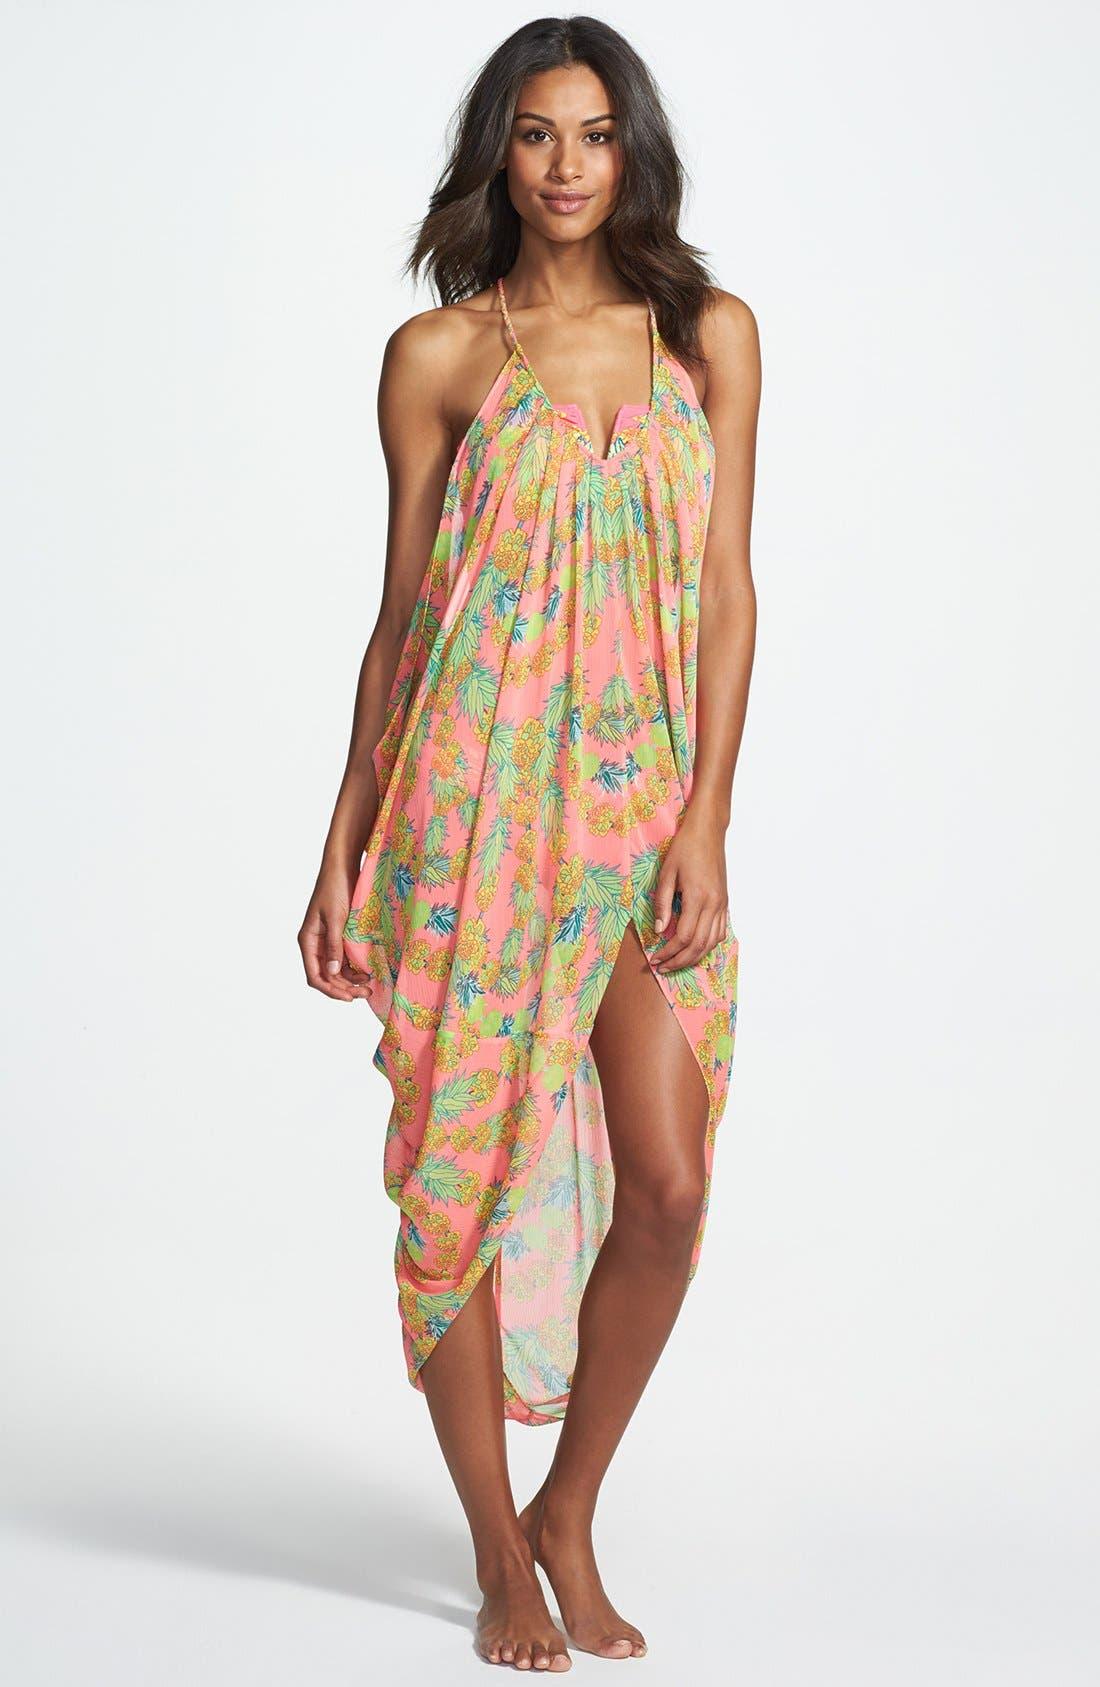 Alternate Image 1 Selected - Mara Hoffman 'Garlands' Chiffon Cover-Up Drape Dress